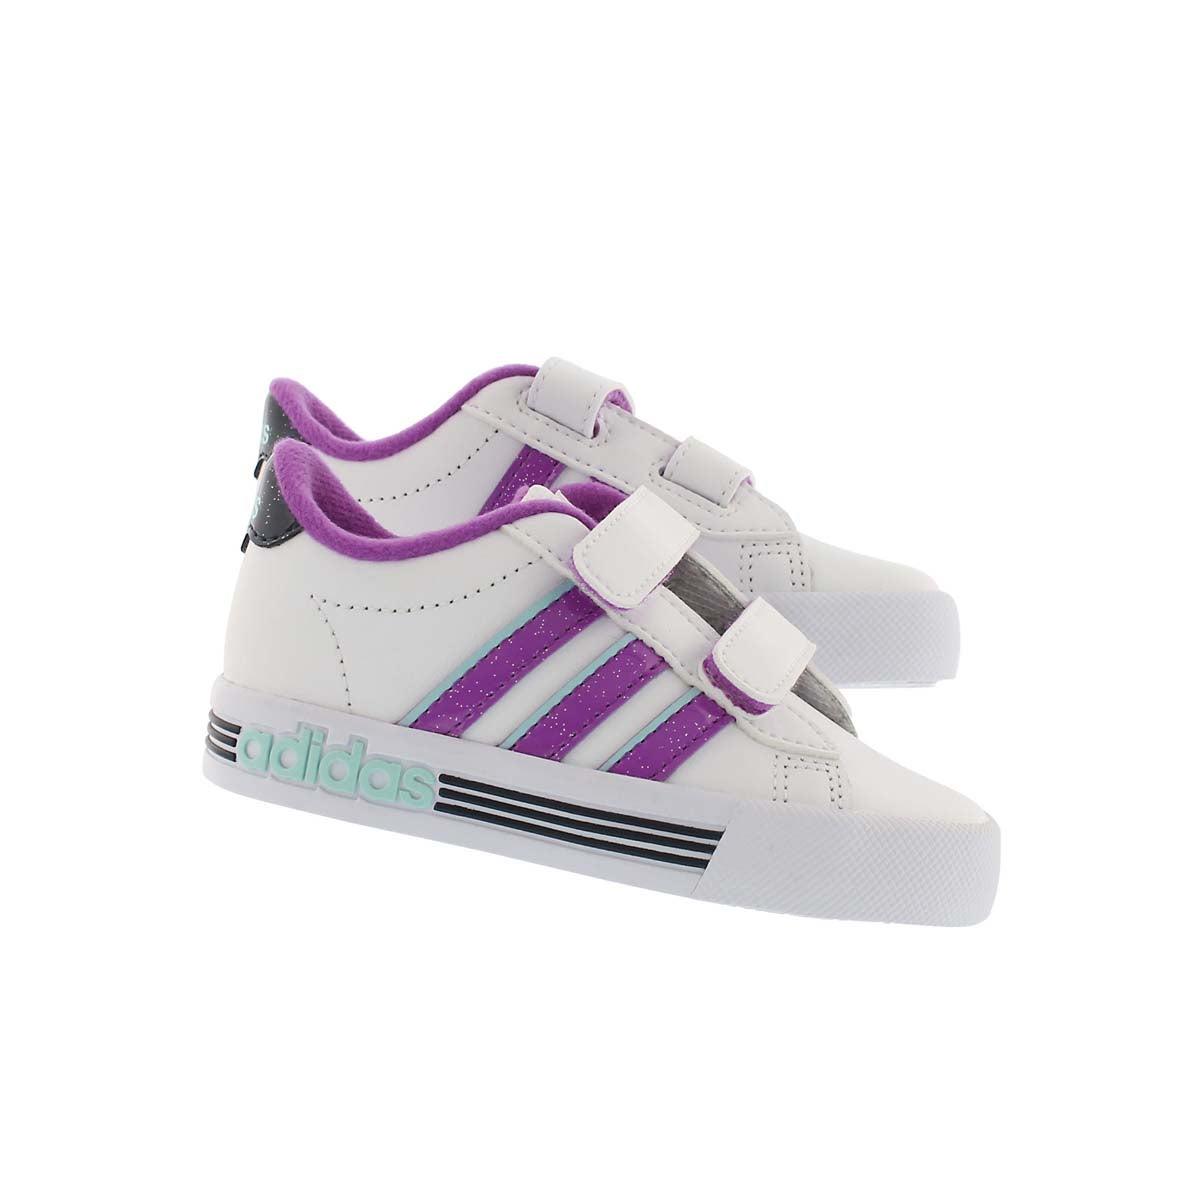 Infs-g Daily Team wht/ppl sneaker